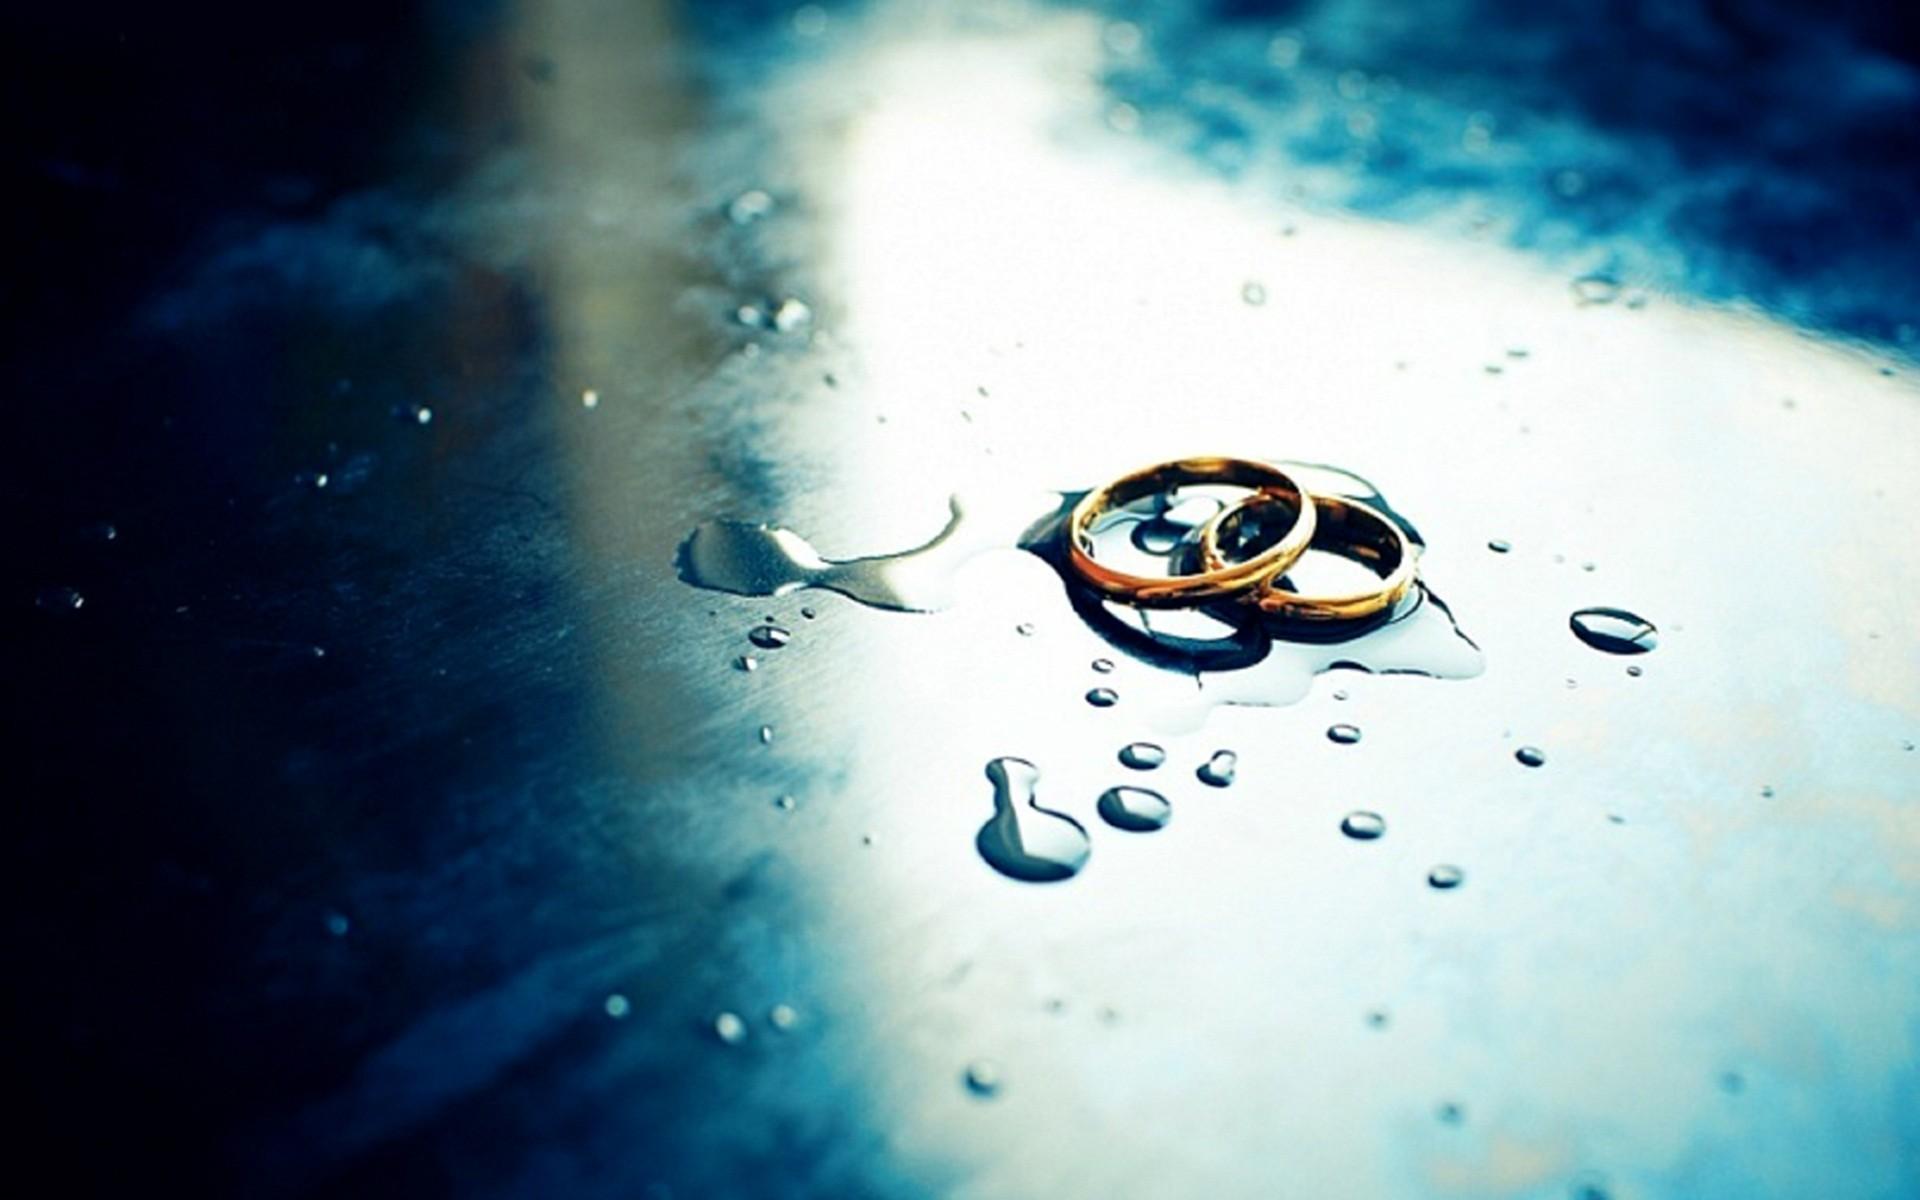 نمونه رأی شرایط صدور حکم بر تجویز ازدواج مجدد